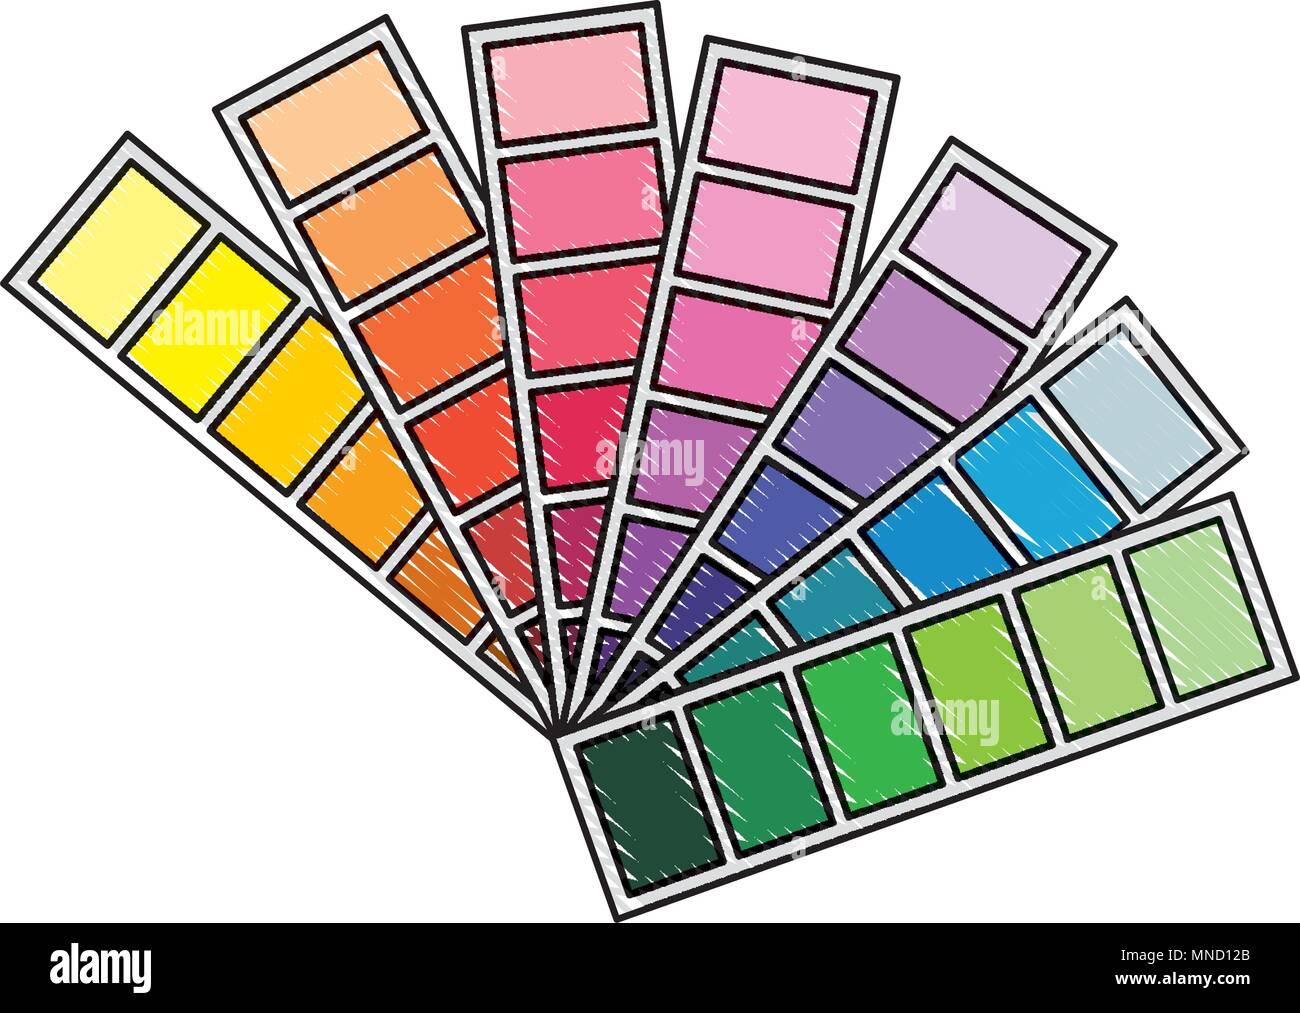 menu color palette graphic design - Stock Image